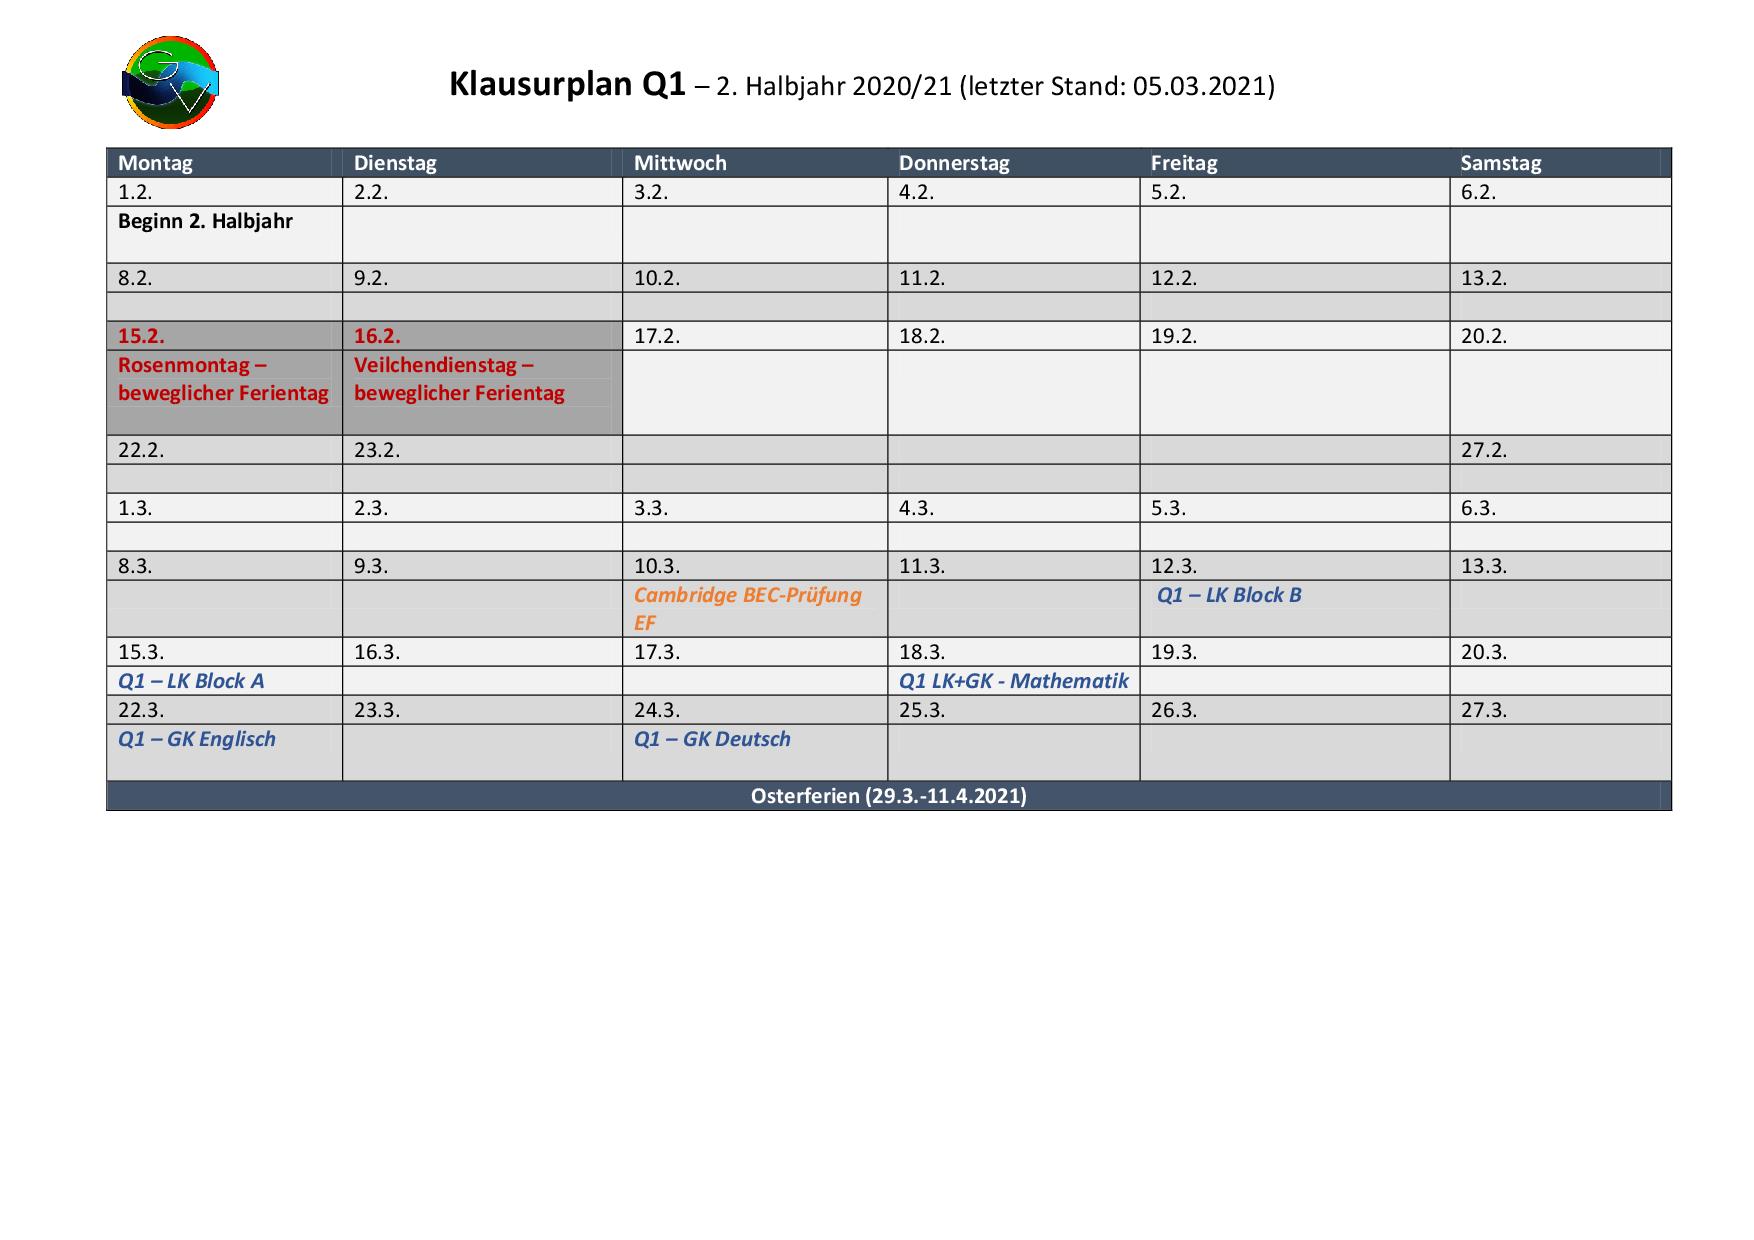 2021-03-05_Klausurplan-Q1-2HJ-4-001